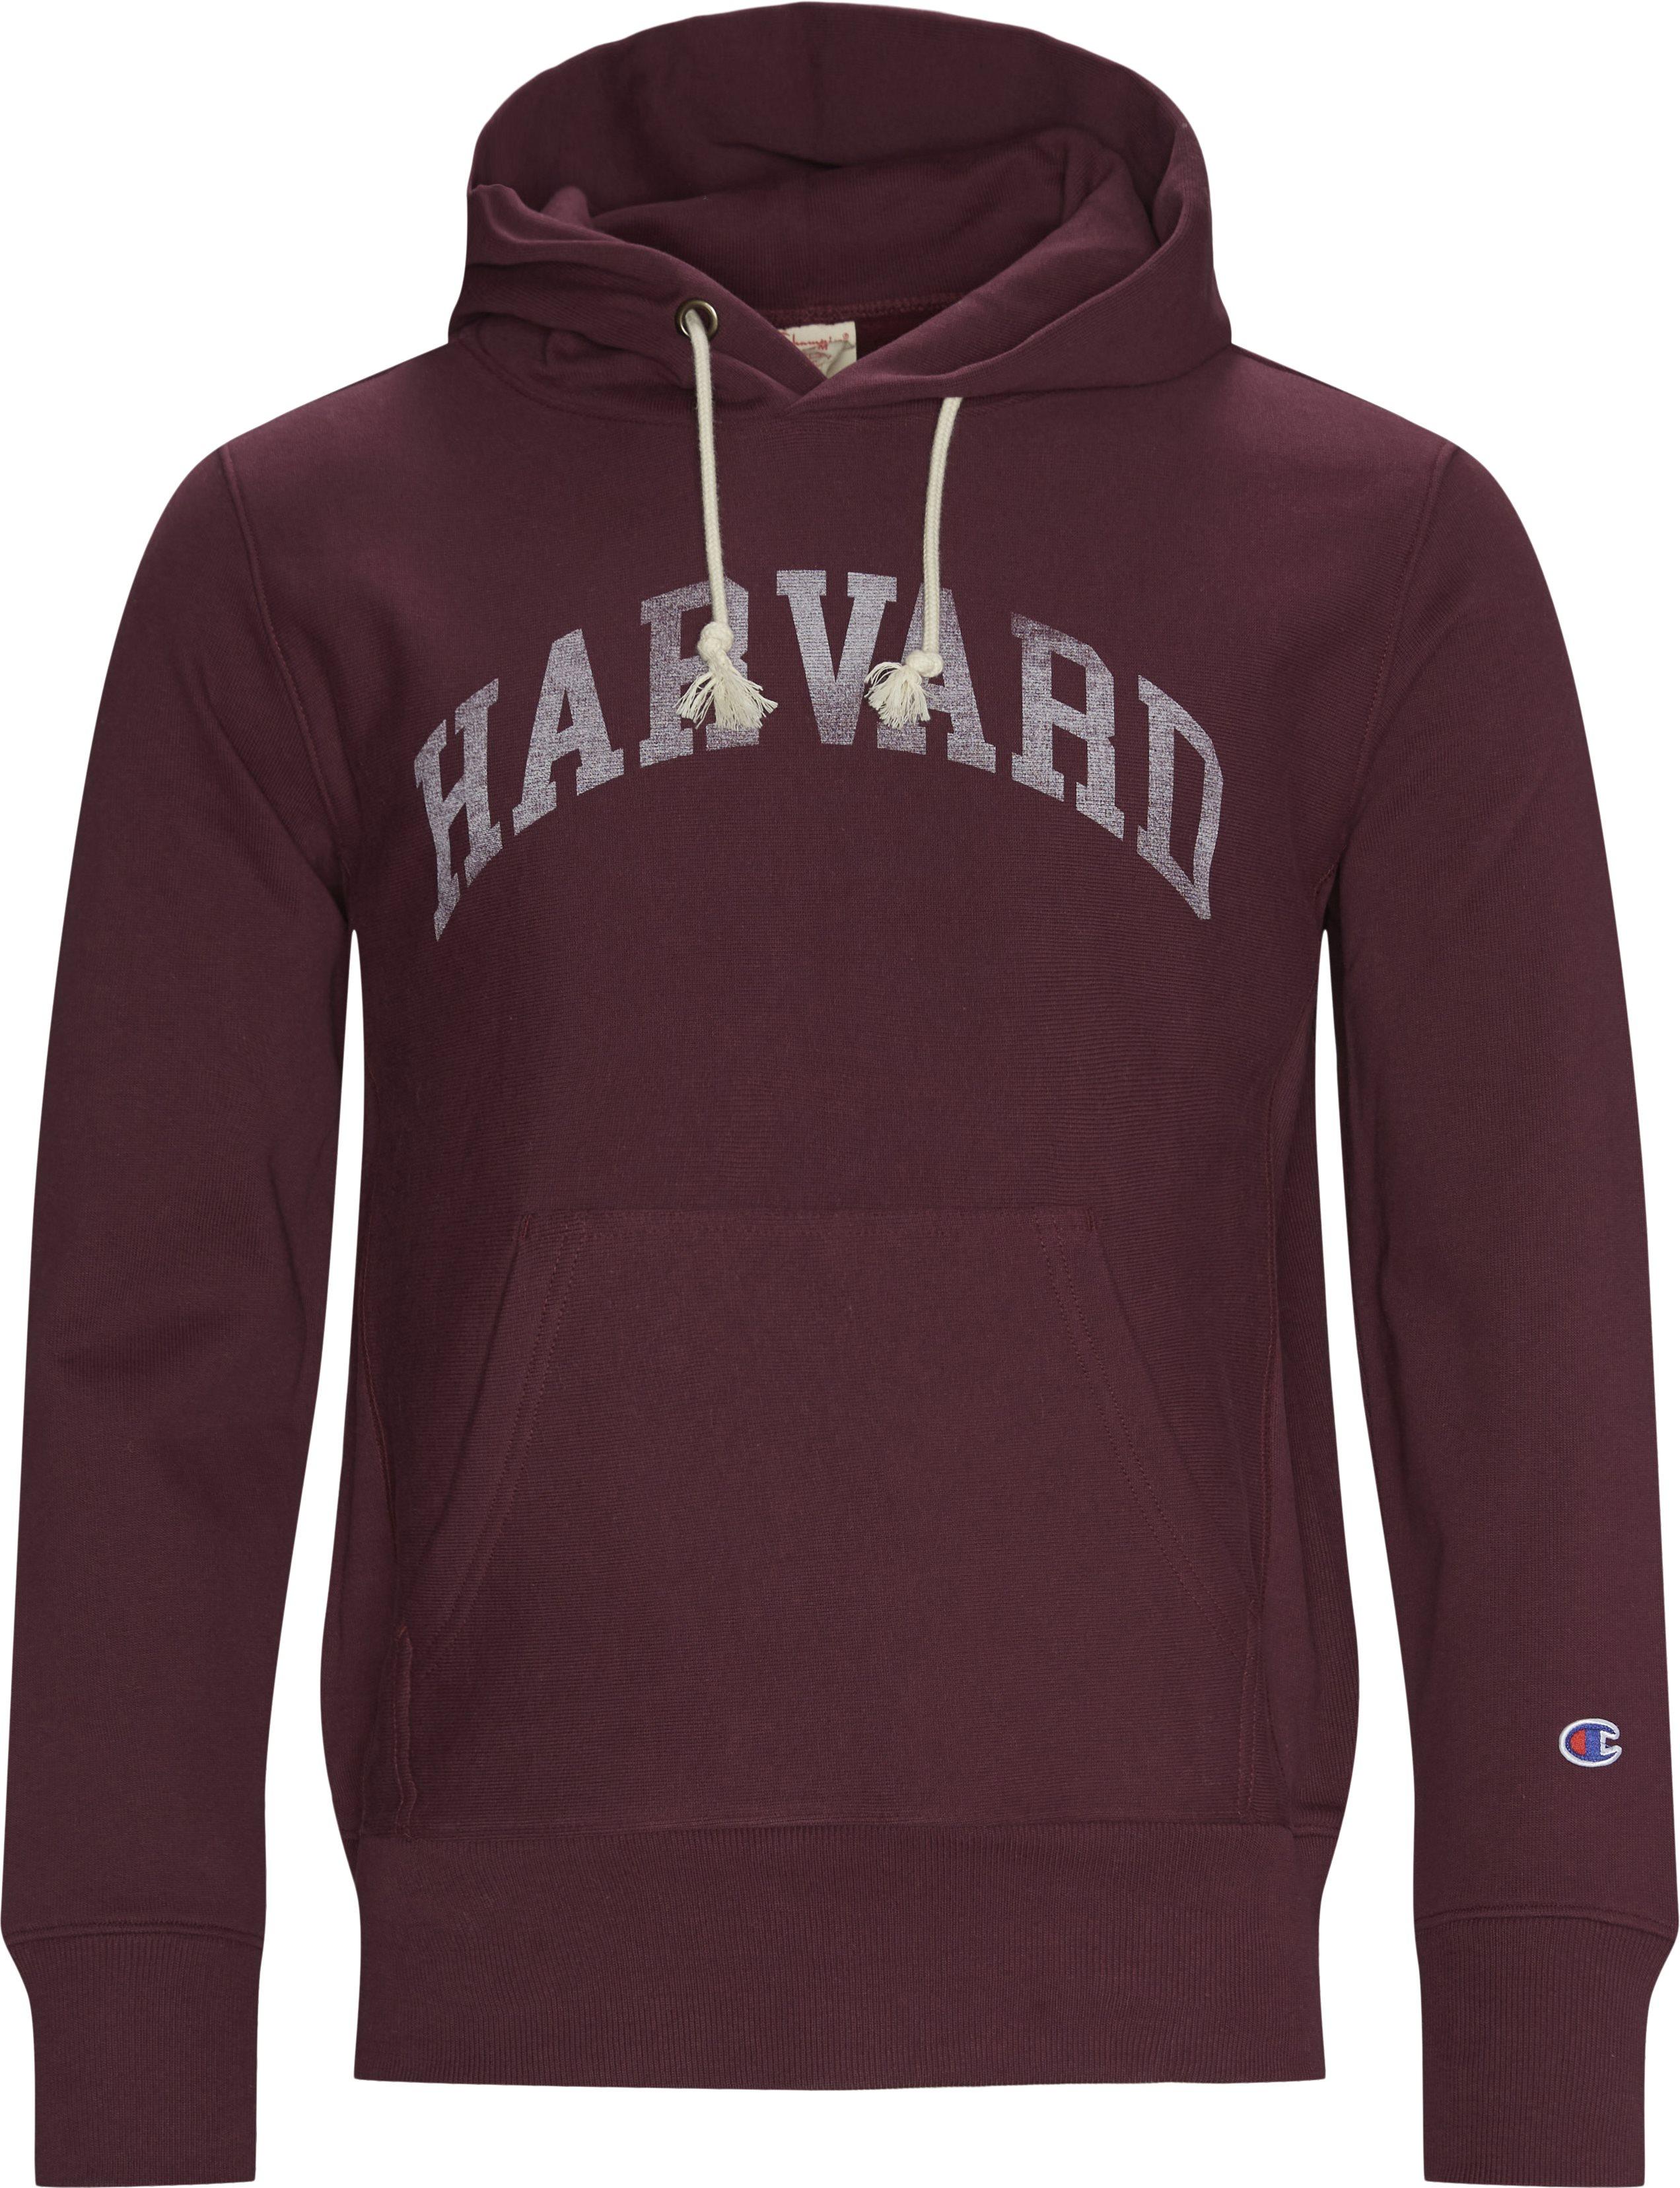 Sweatshirts - Regular fit - Bordeaux